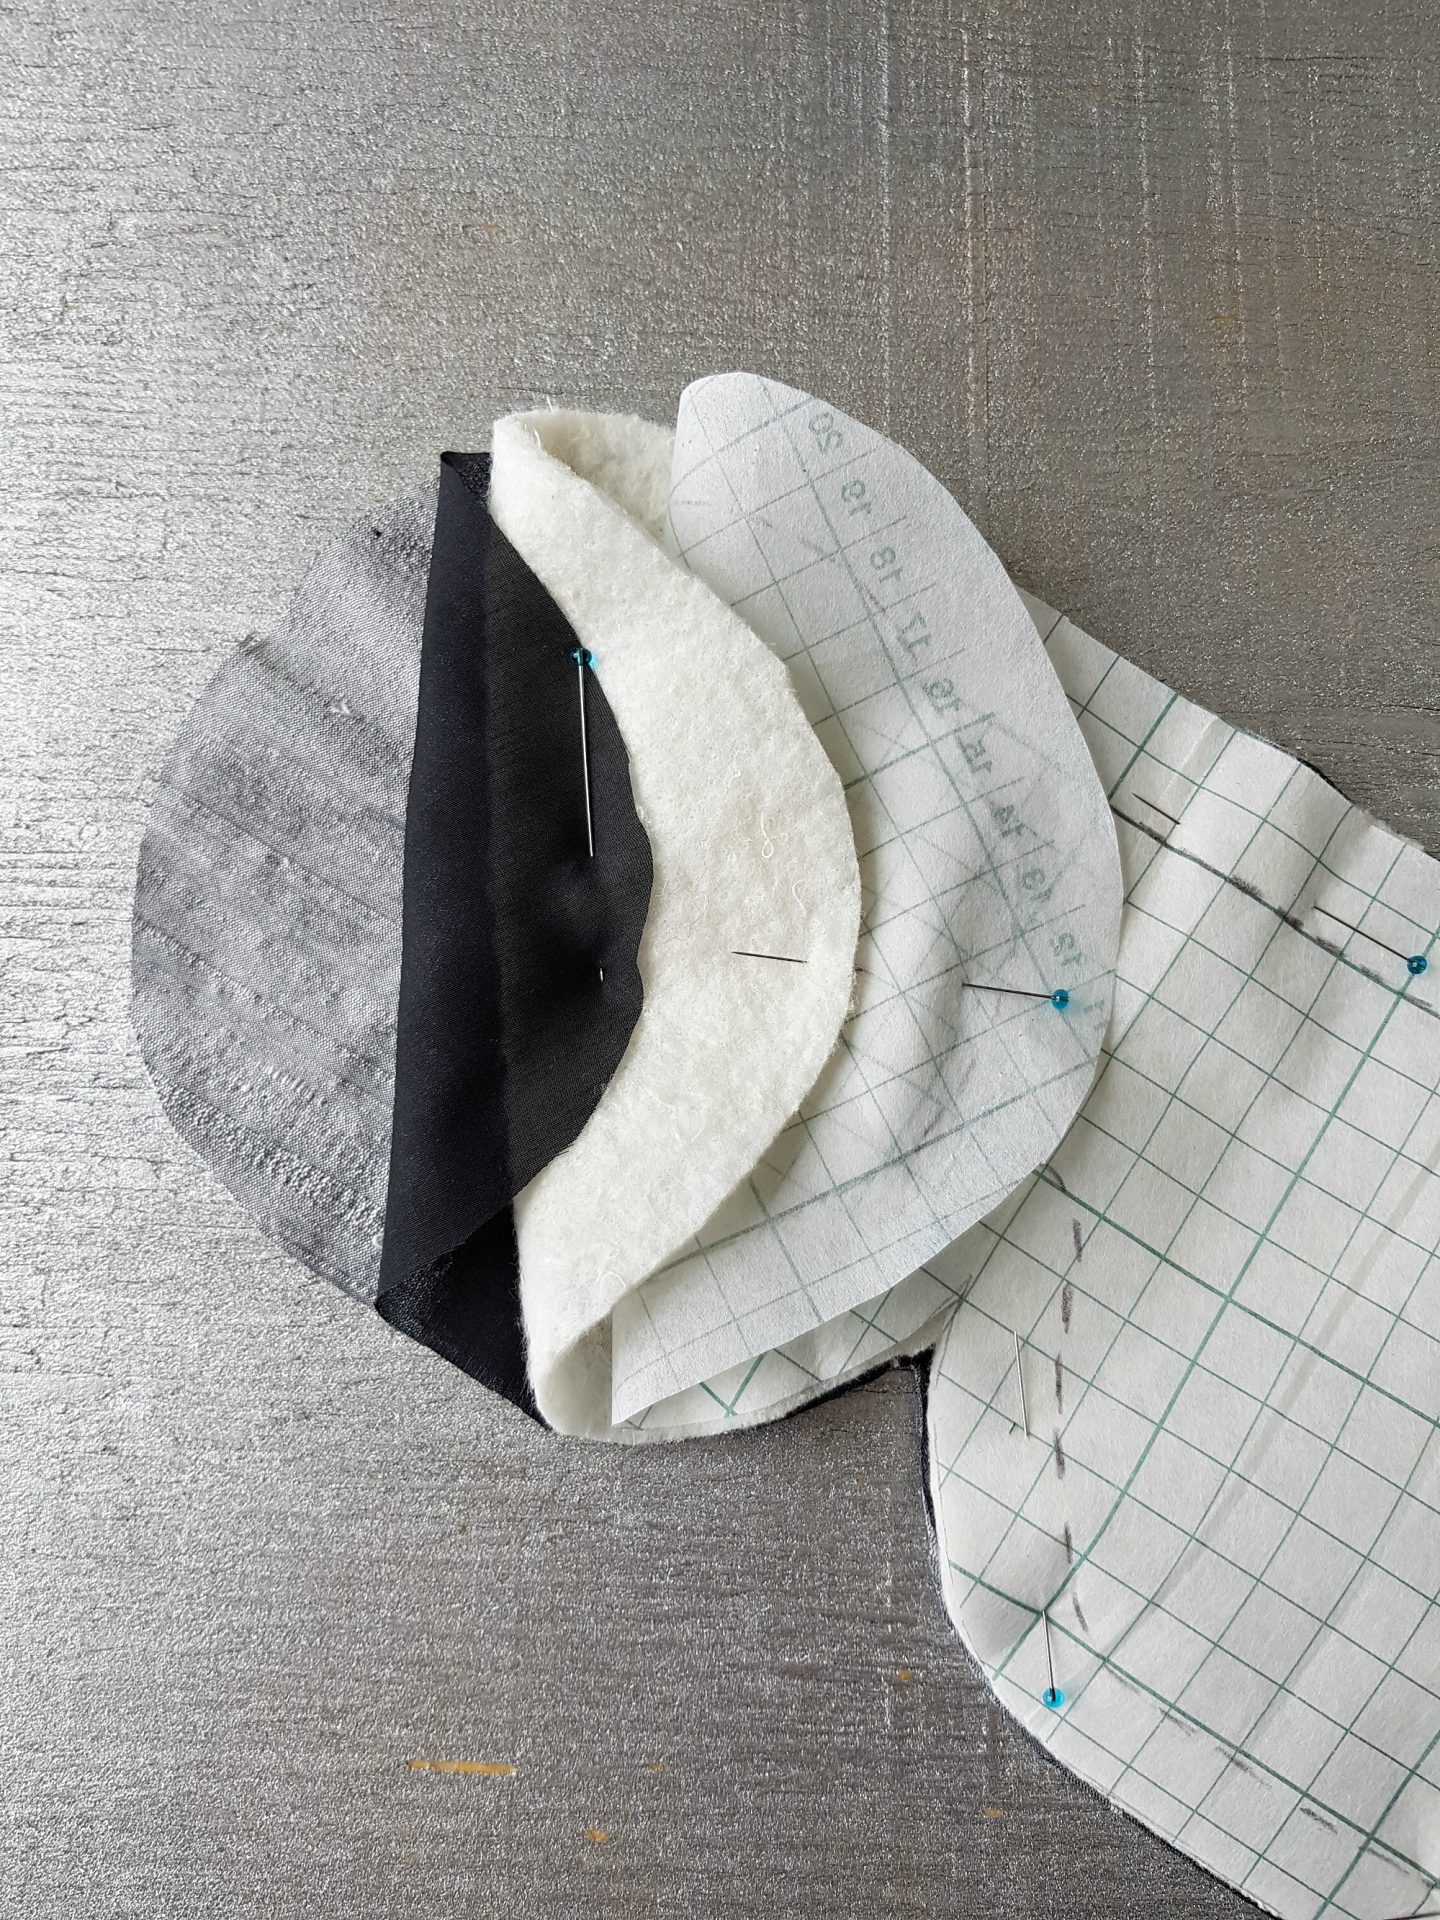 Learn How to Sew an Easy DIY Sleep Mask with Silk Fabric That's Gentle on Skin #sewing #sleepmask #sleep